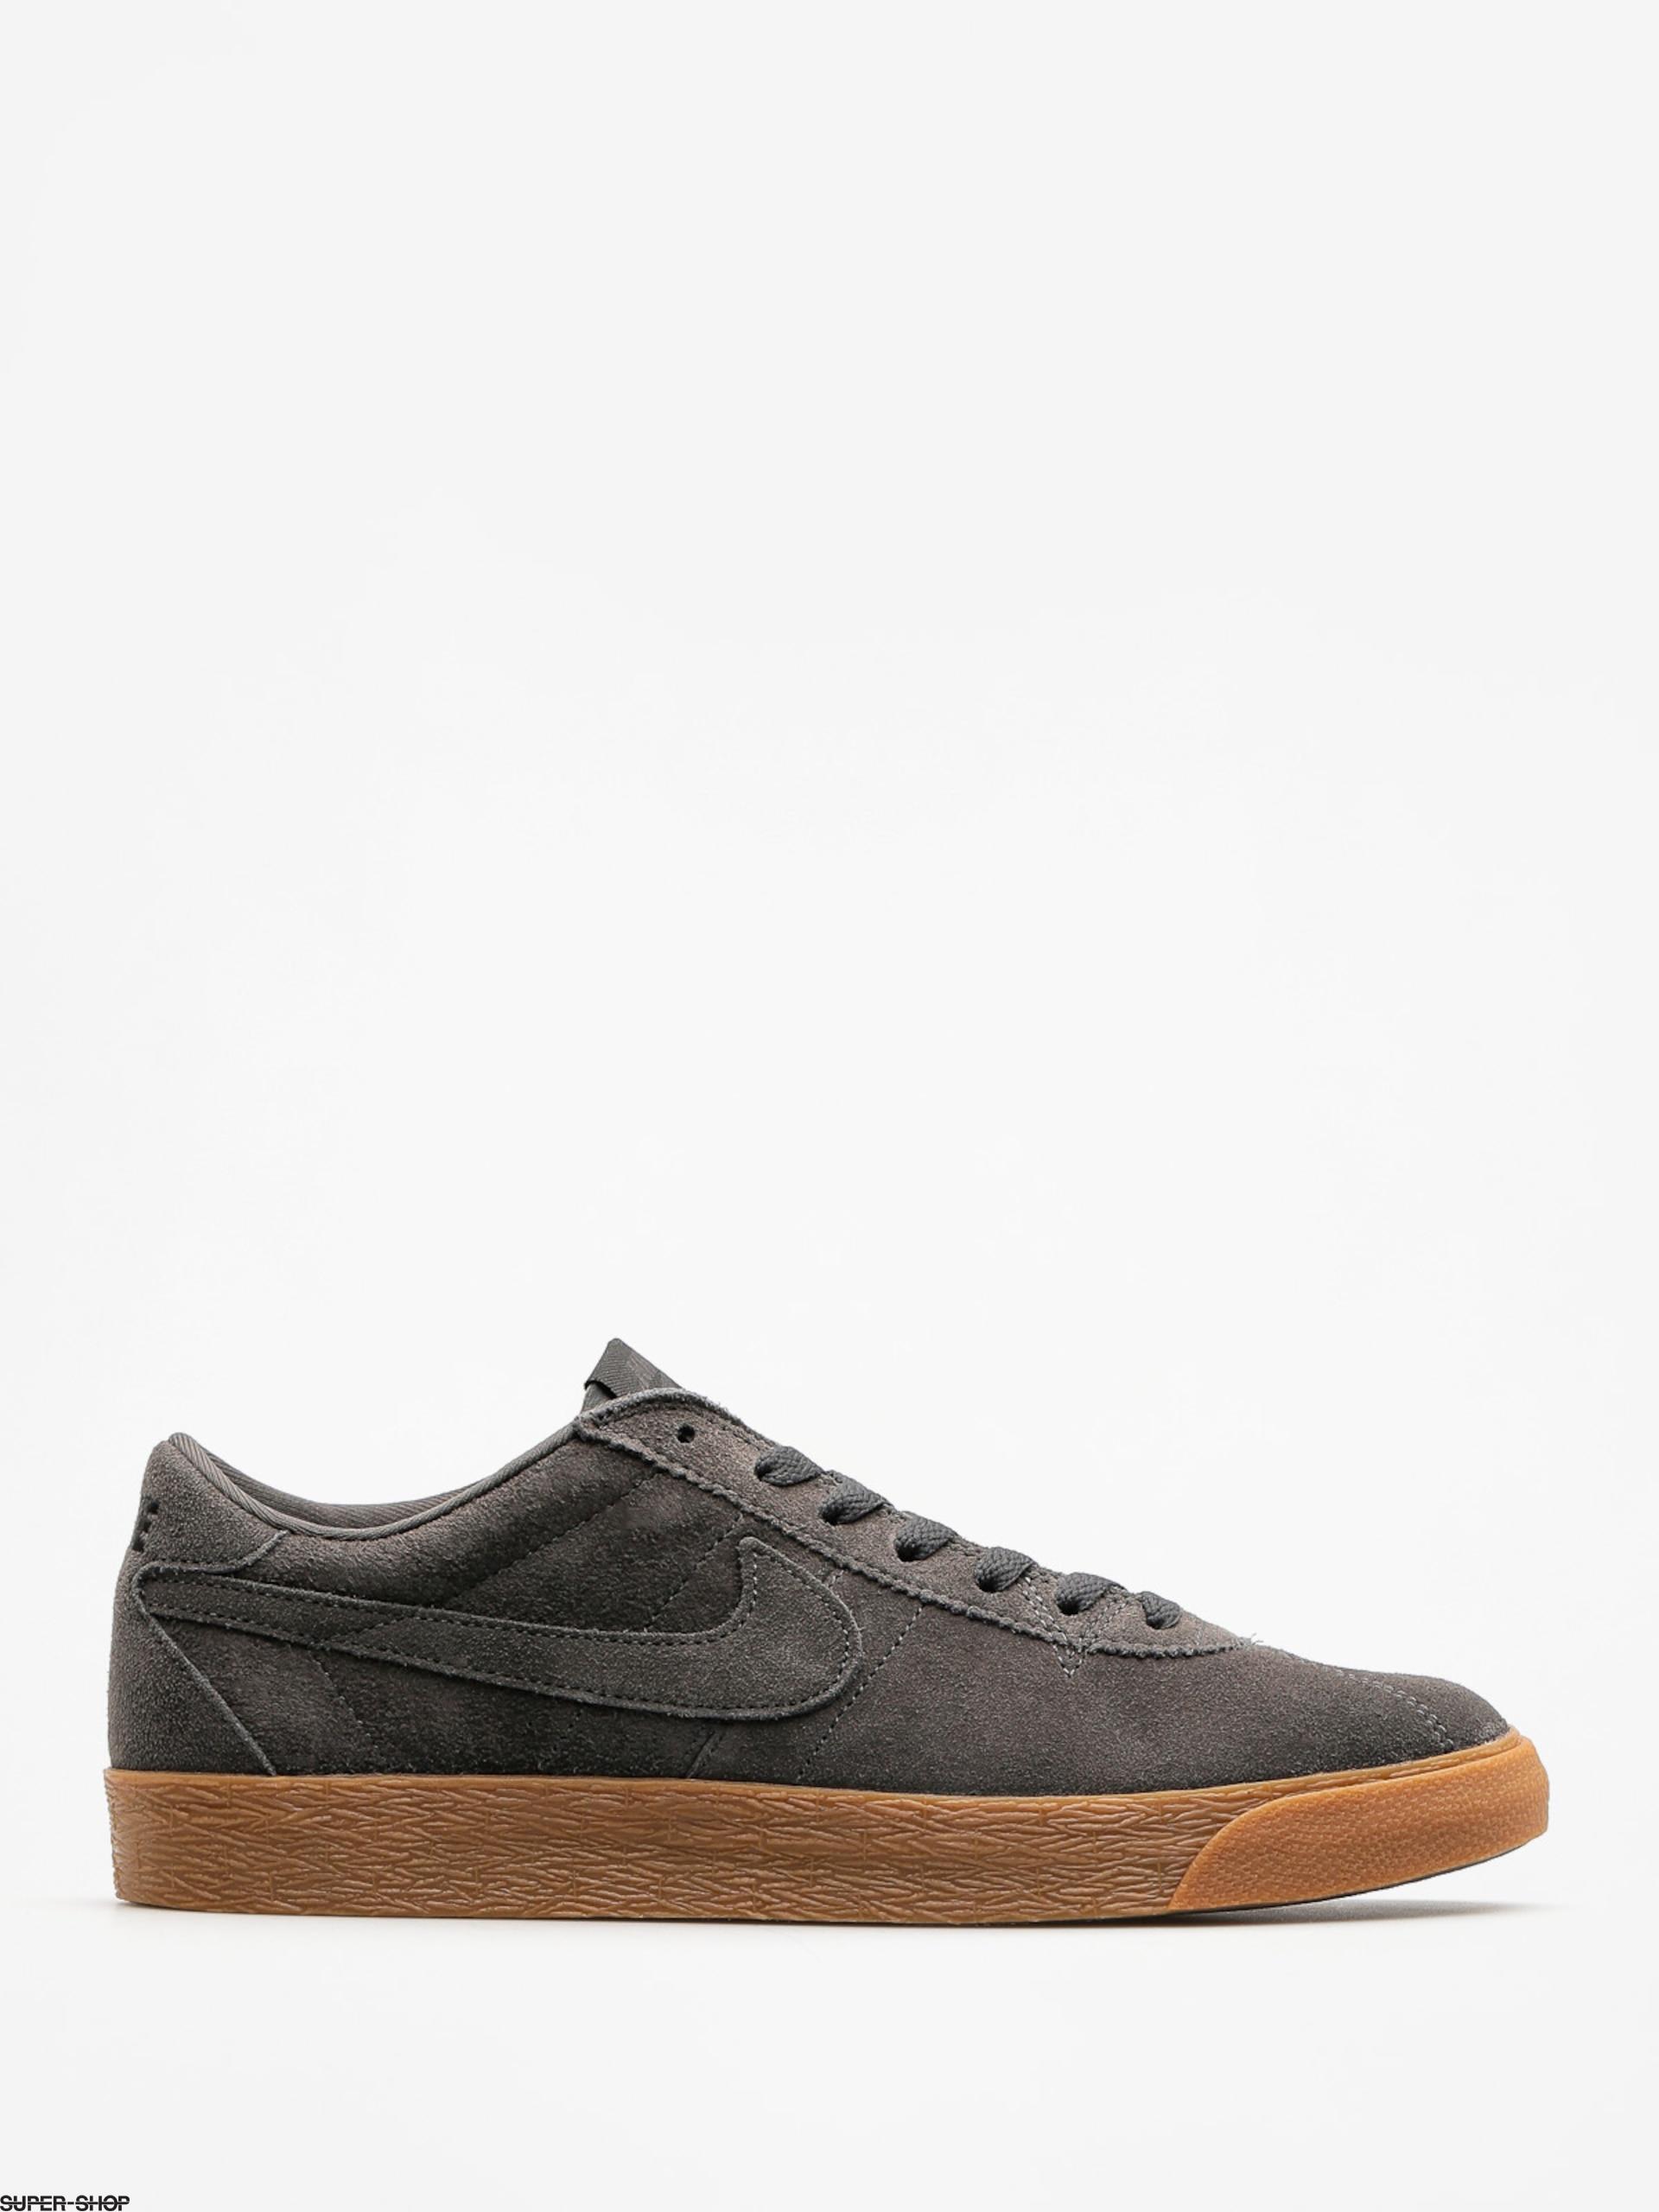 7e78c346ed49 Nike SB Shoes Zoom Bruin Premium Se (anthracite anthracite black)